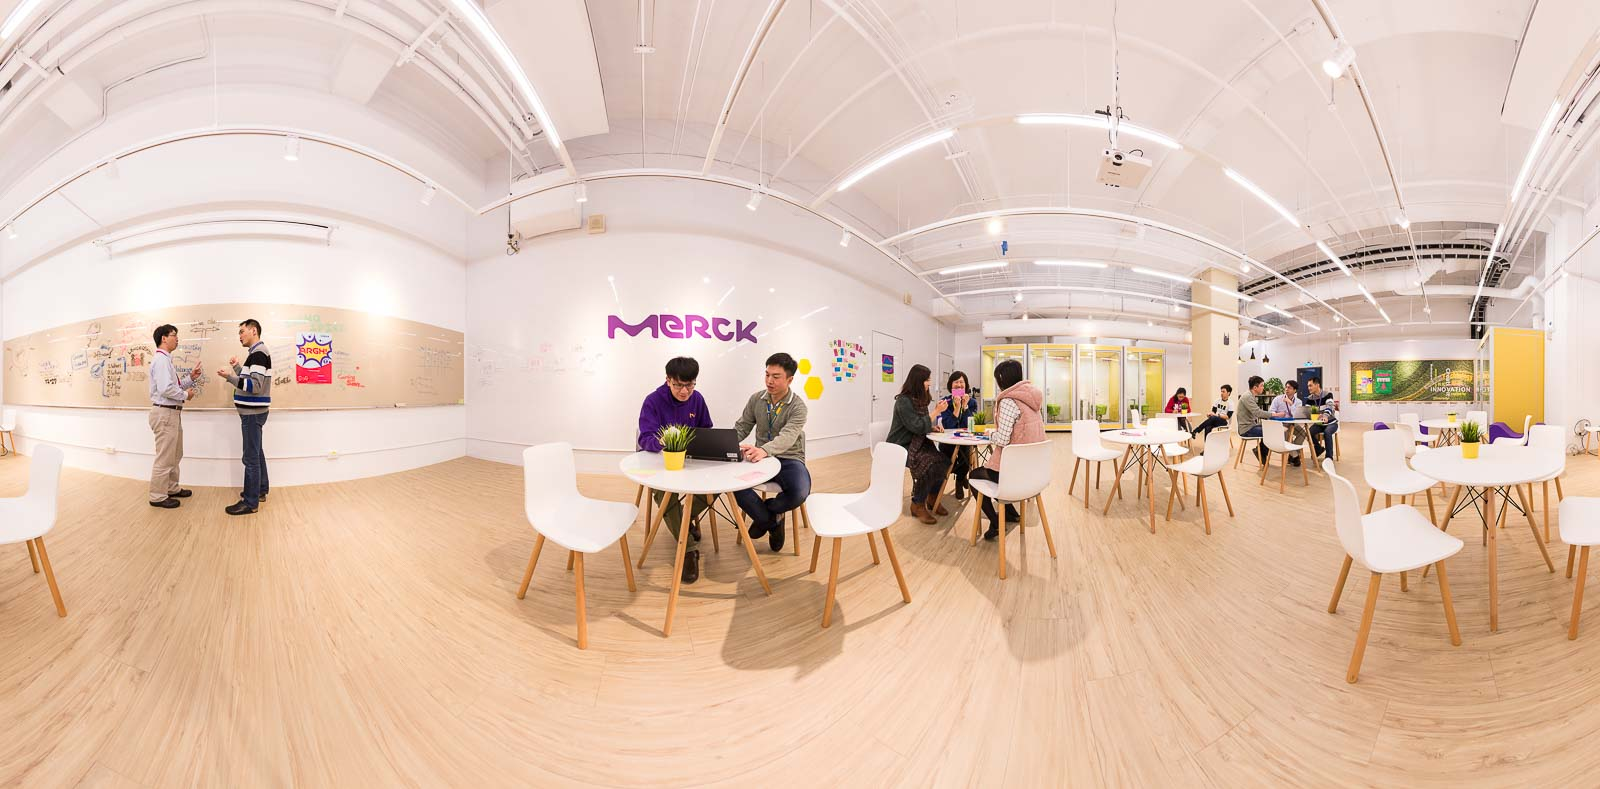 360 Panorama eines Innovation Rooms in Taiwan mit mehreren Mitarbeitern, Industrie Merck Tobi Bohn